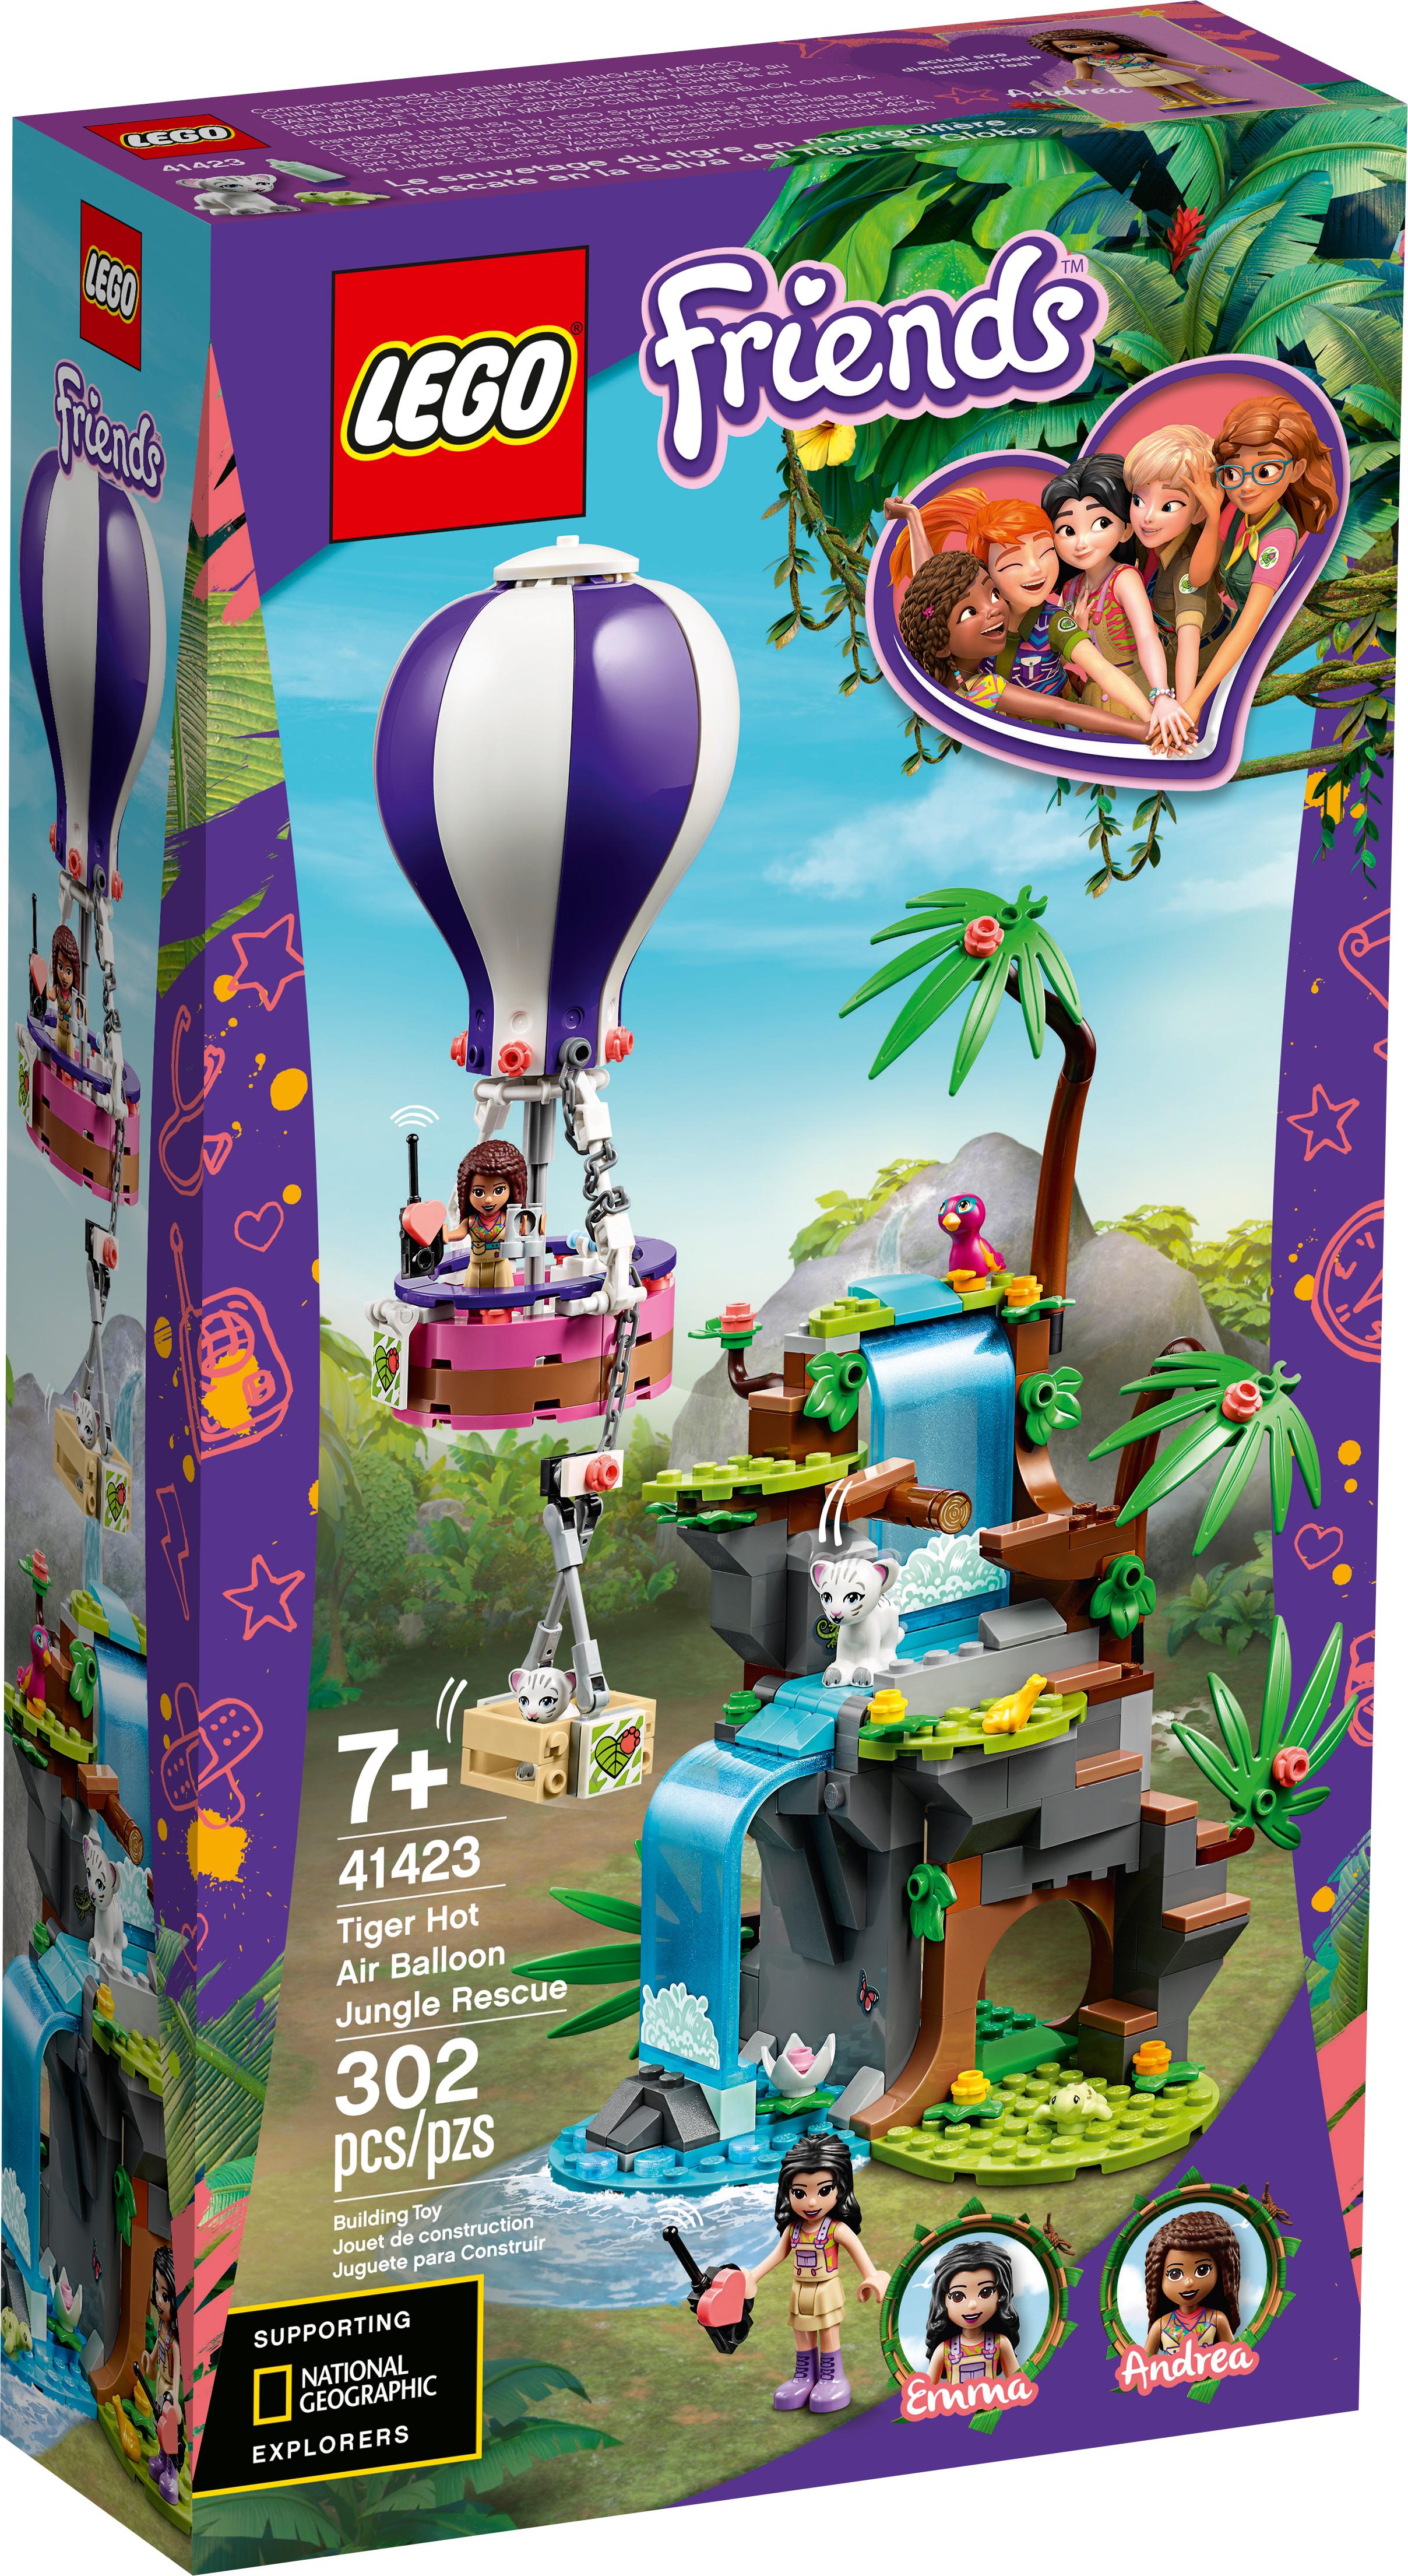 Tiger Hot Air Balloon Jungle Rescue